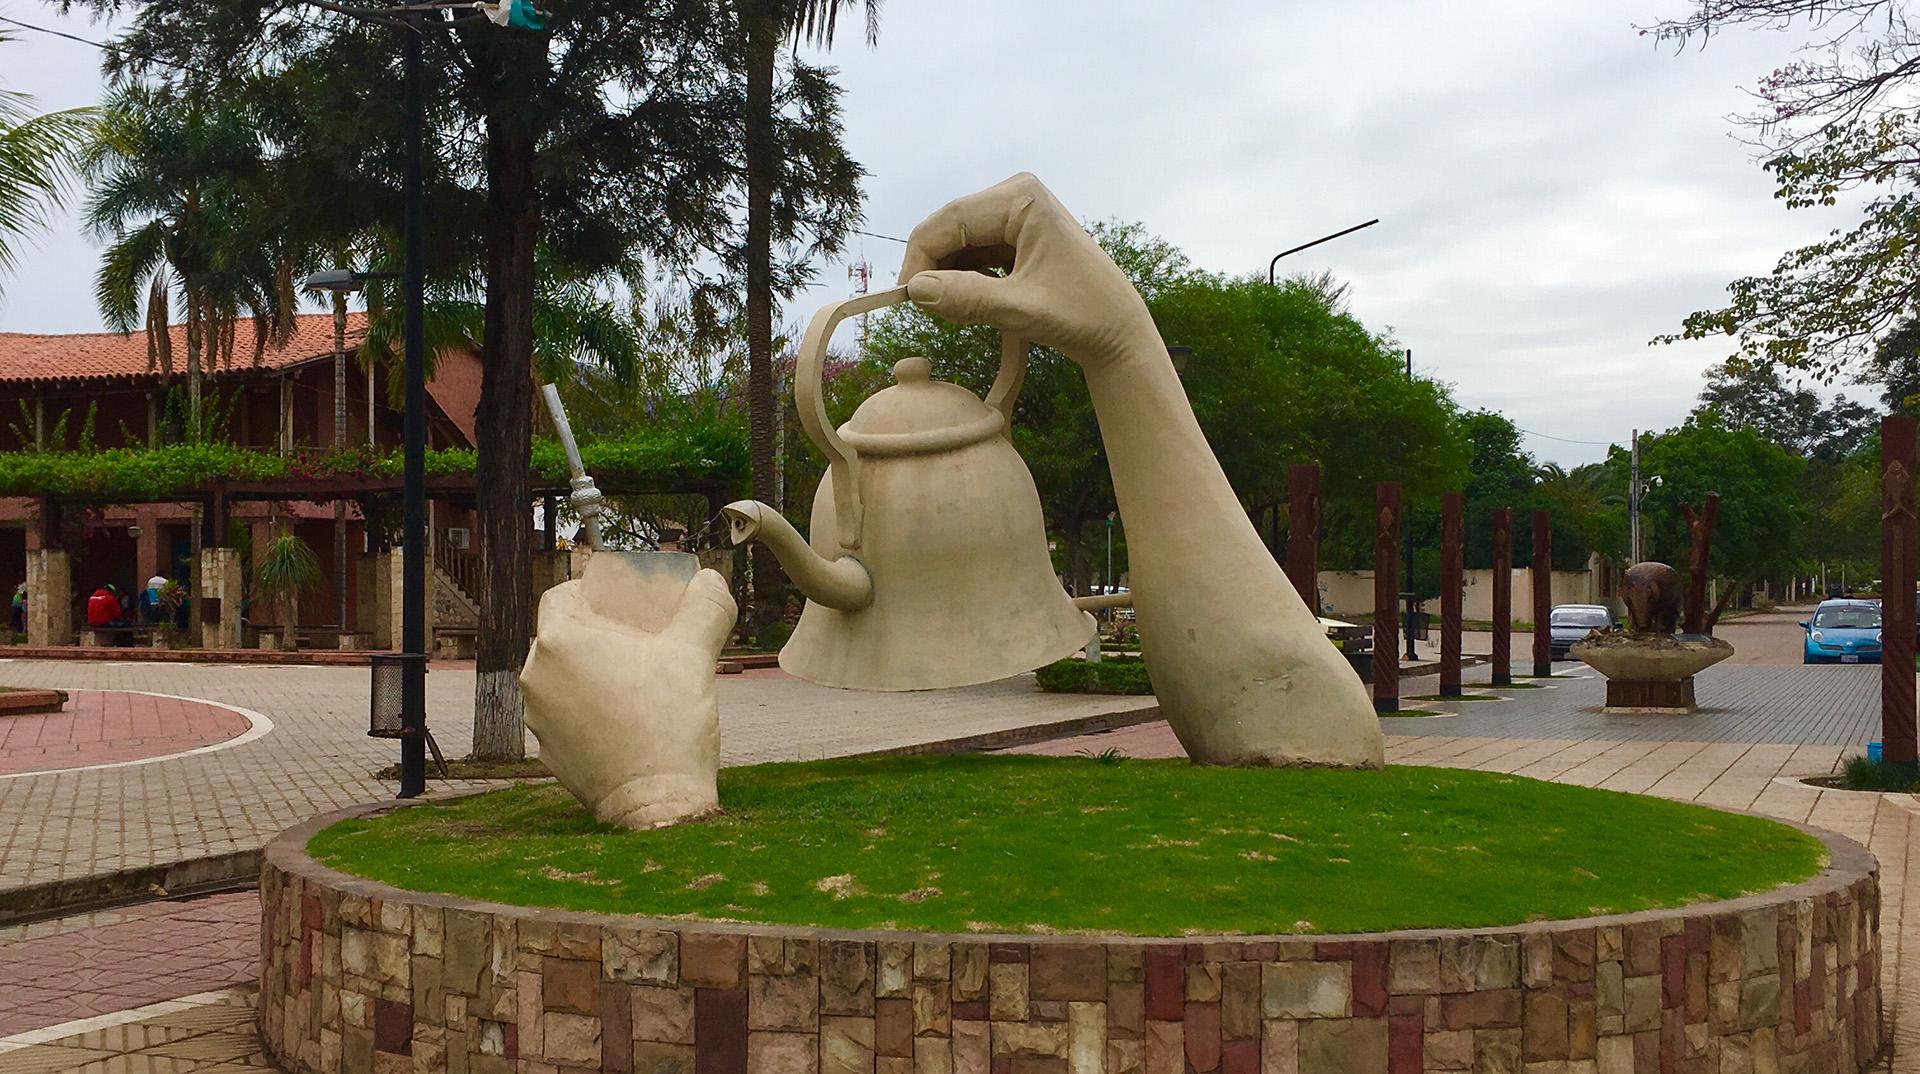 monumento mate villamontes bolivia pablocaminante - Sudamérica